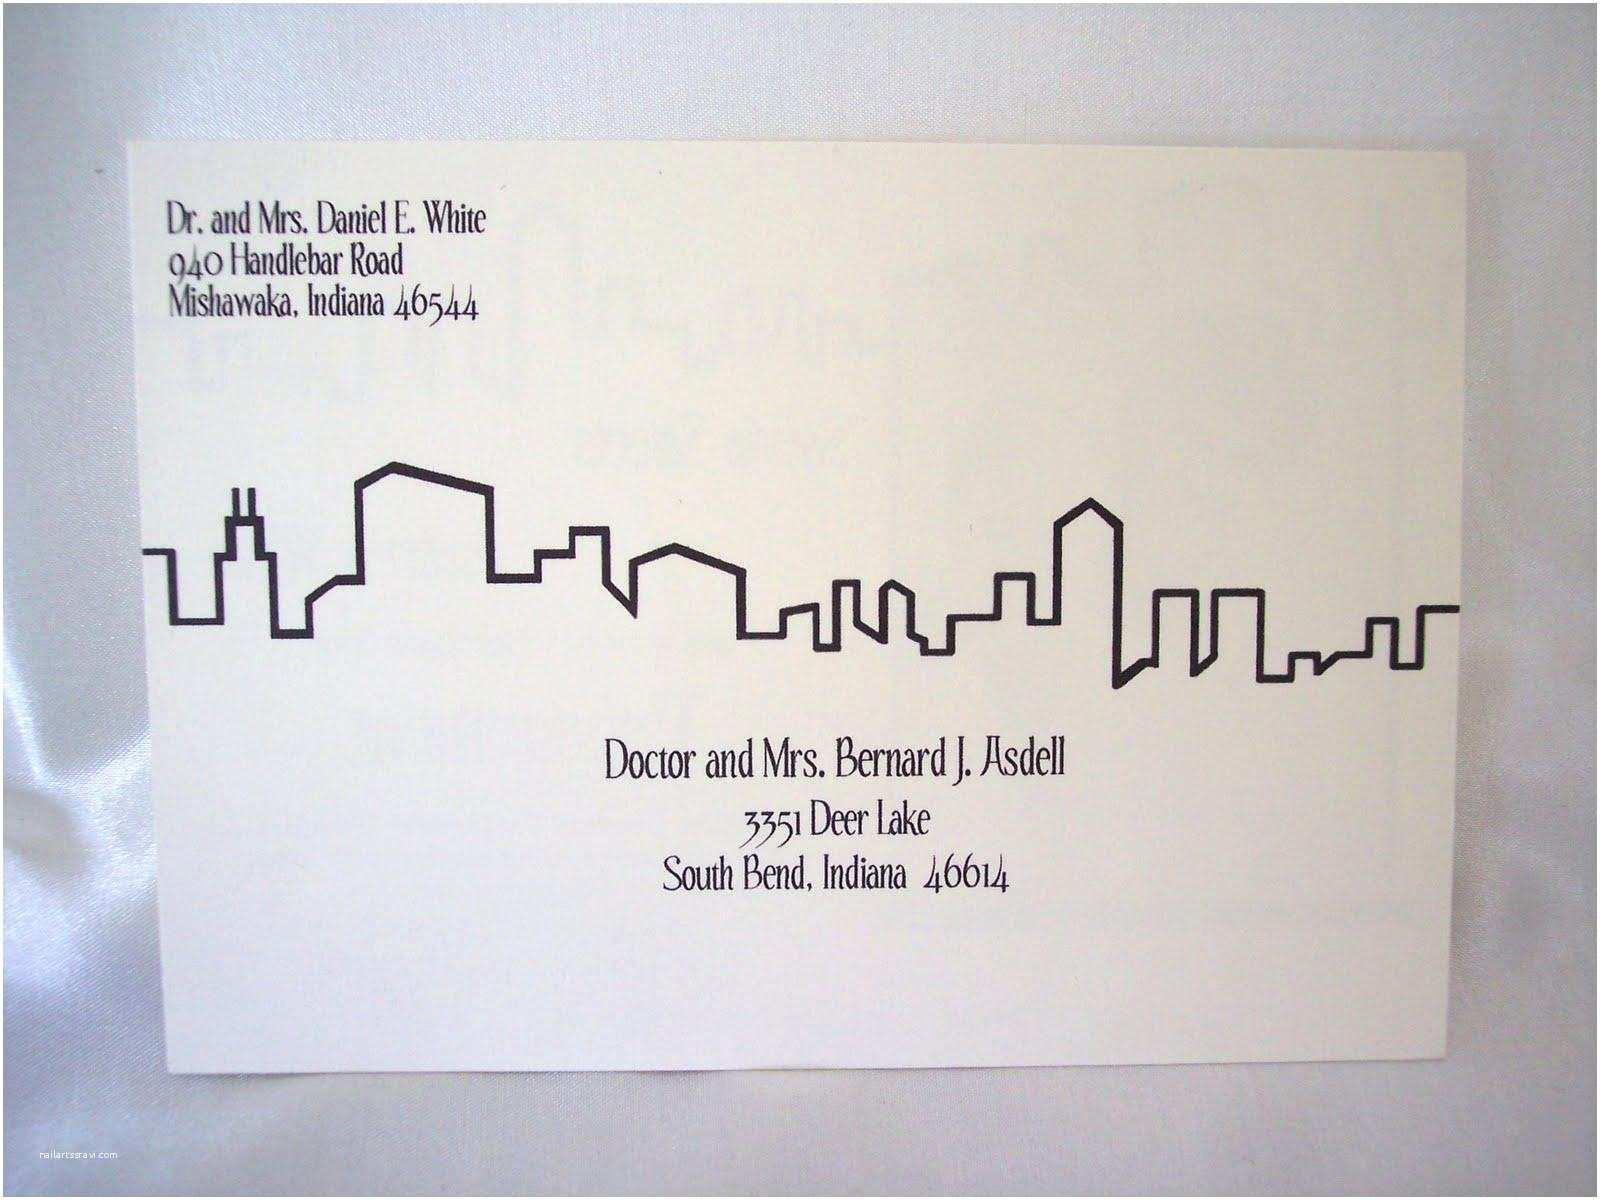 Addressing Wedding Invitation Envelopes Bridal Shower Invitation Verbiage Bridal Shower